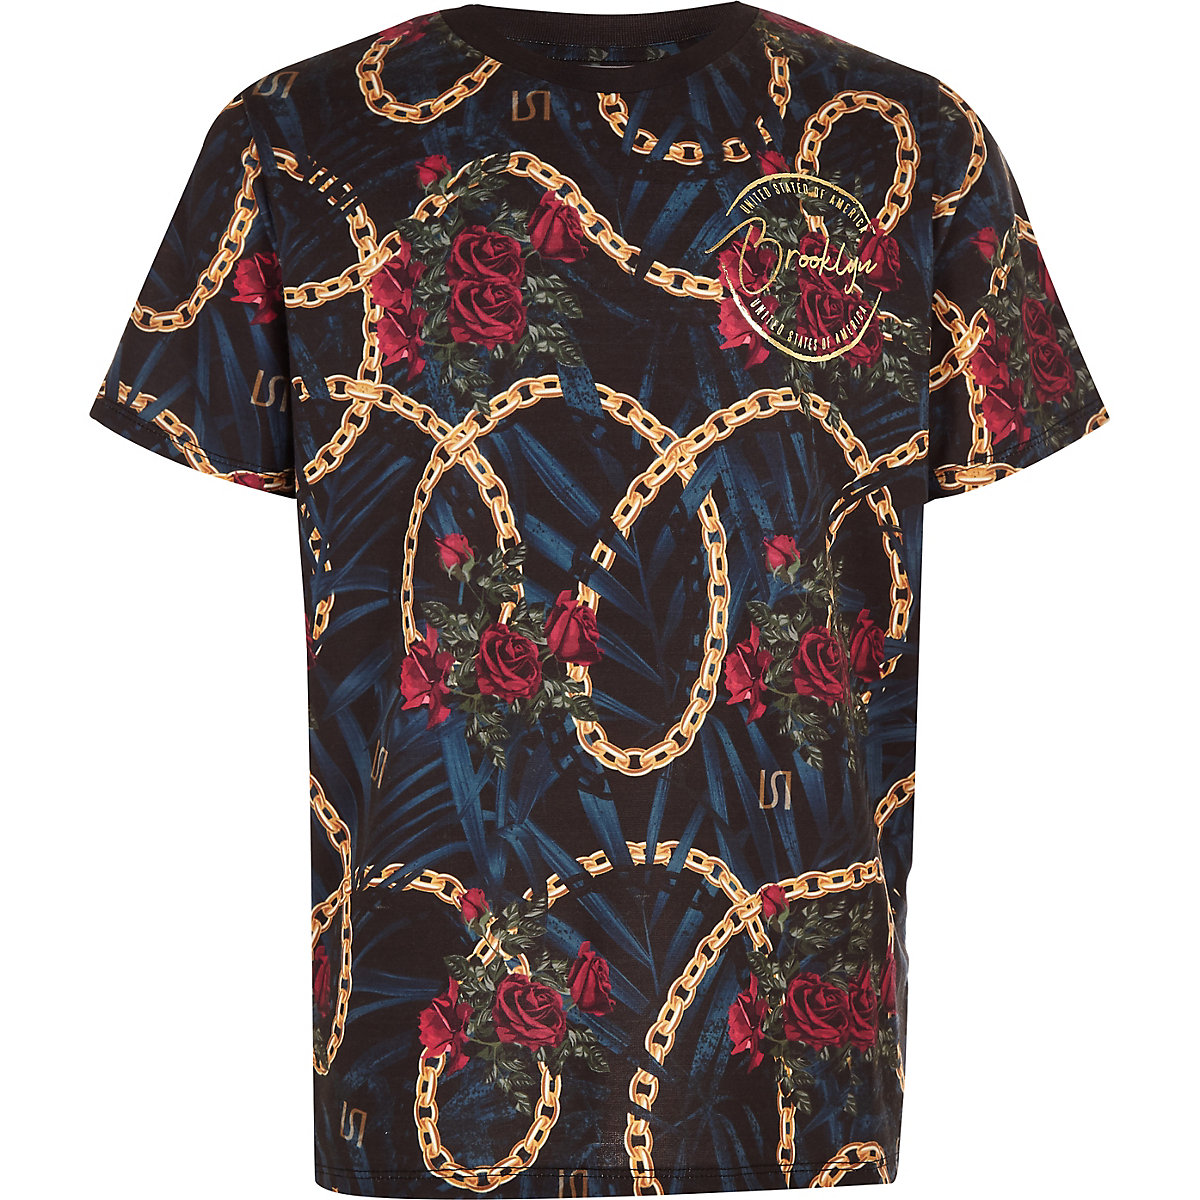 Boys black chain print T-shirt